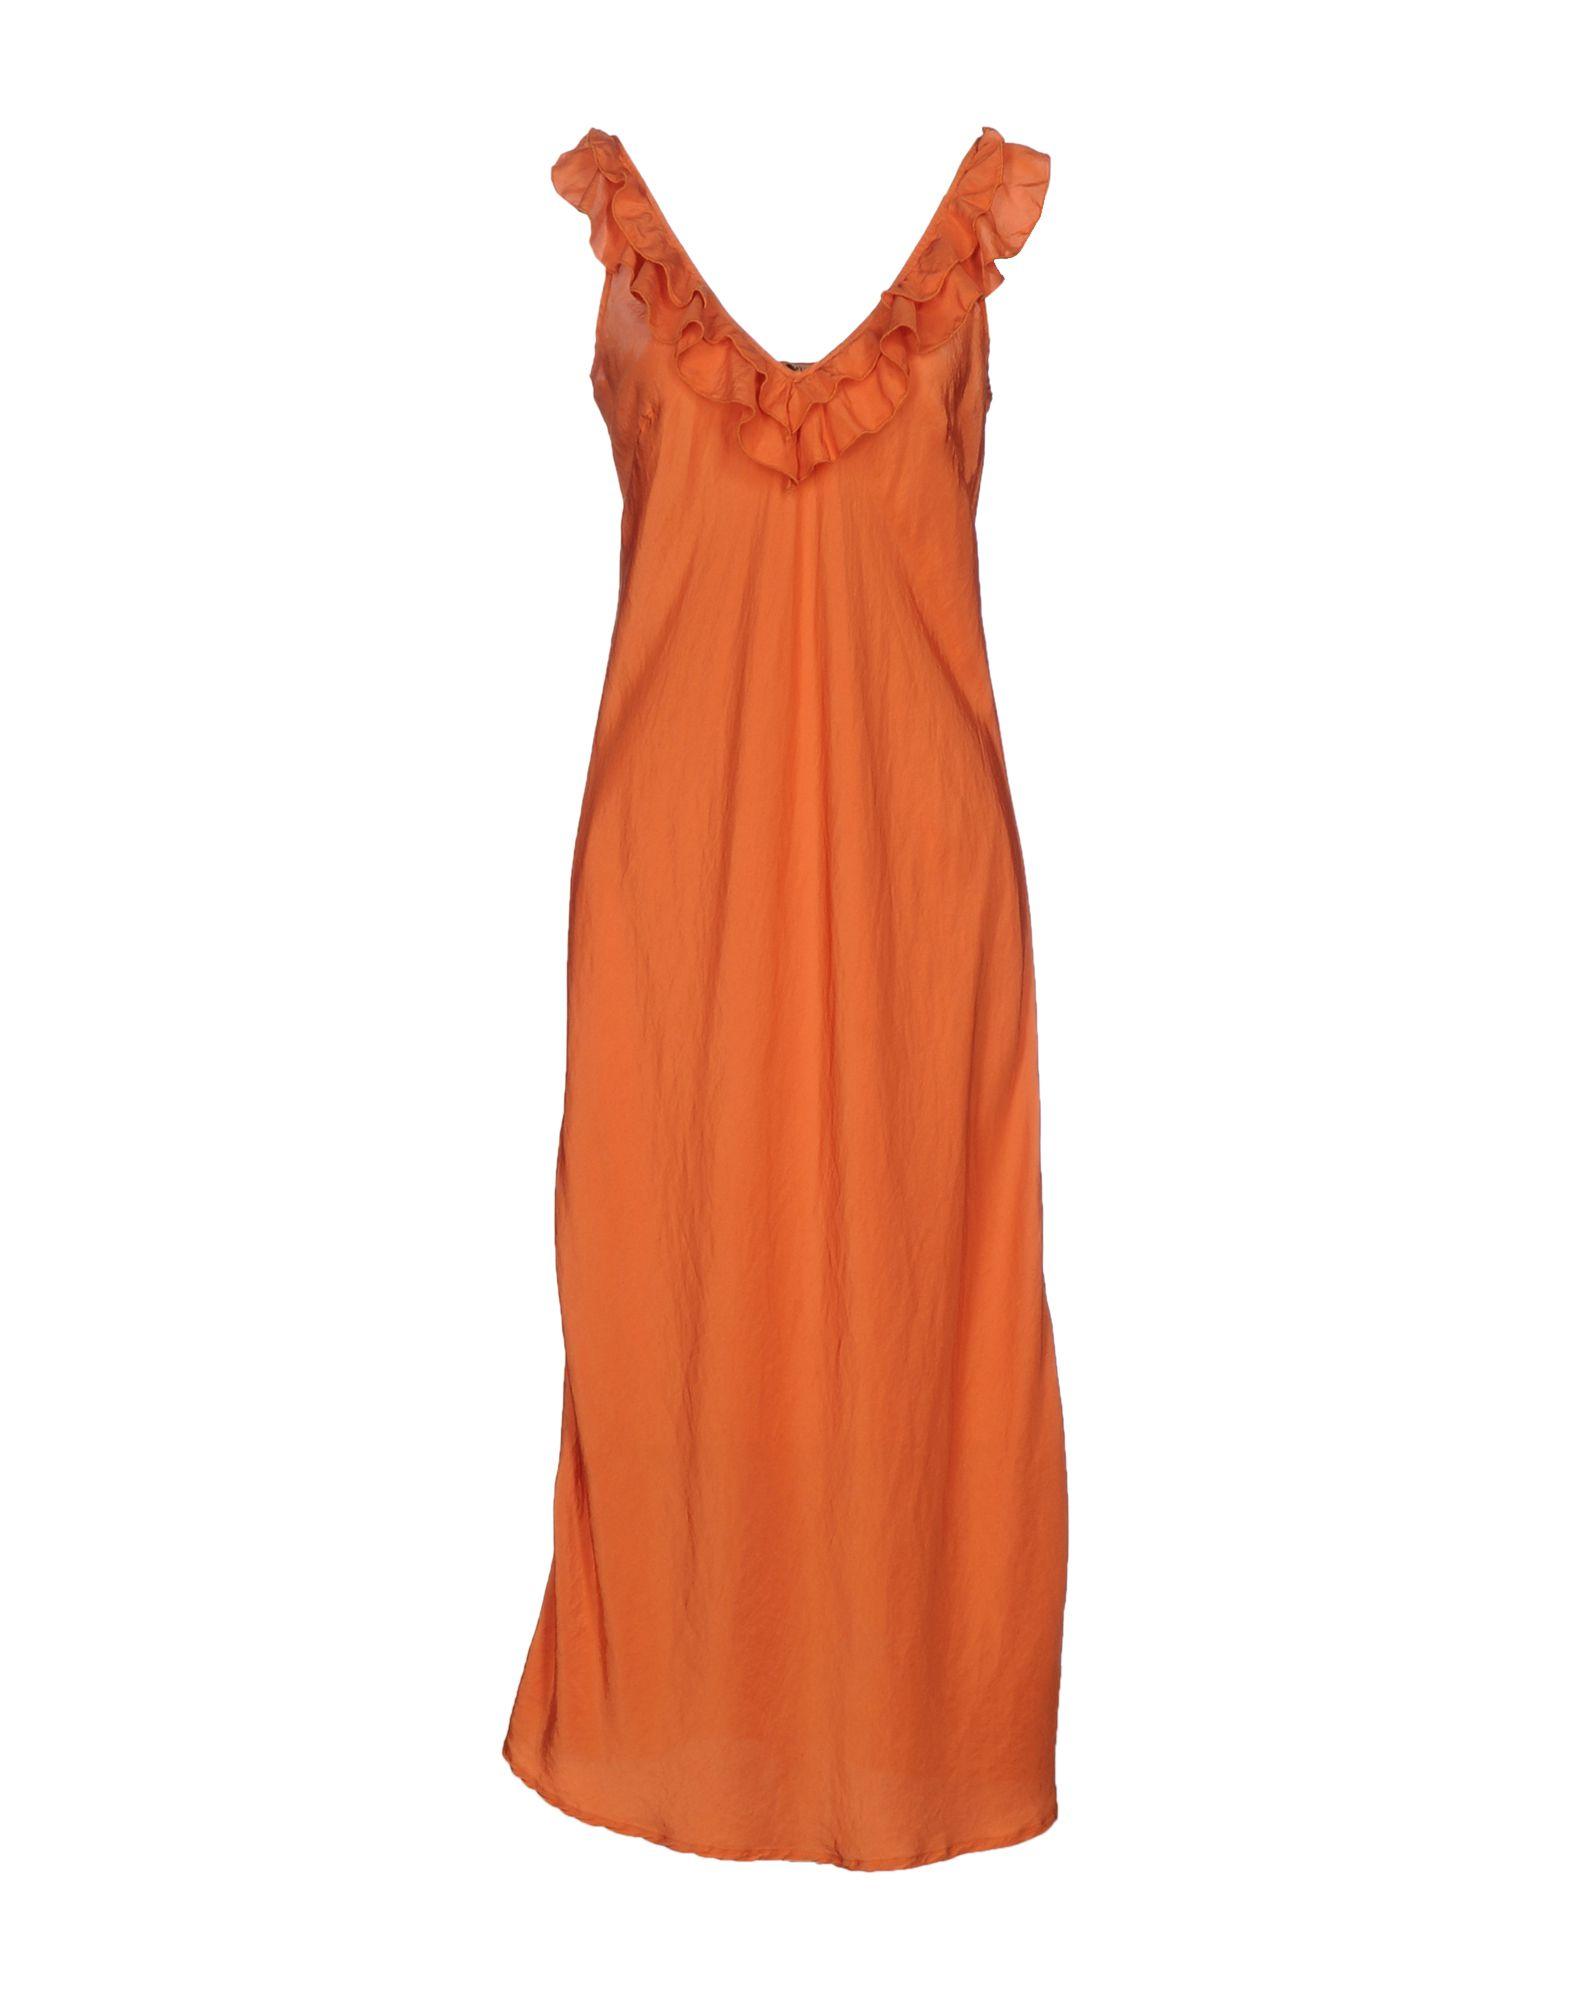 GRAZIA'LLIANI SOON Платье длиной 3/4 lisa corti платье длиной 3 4